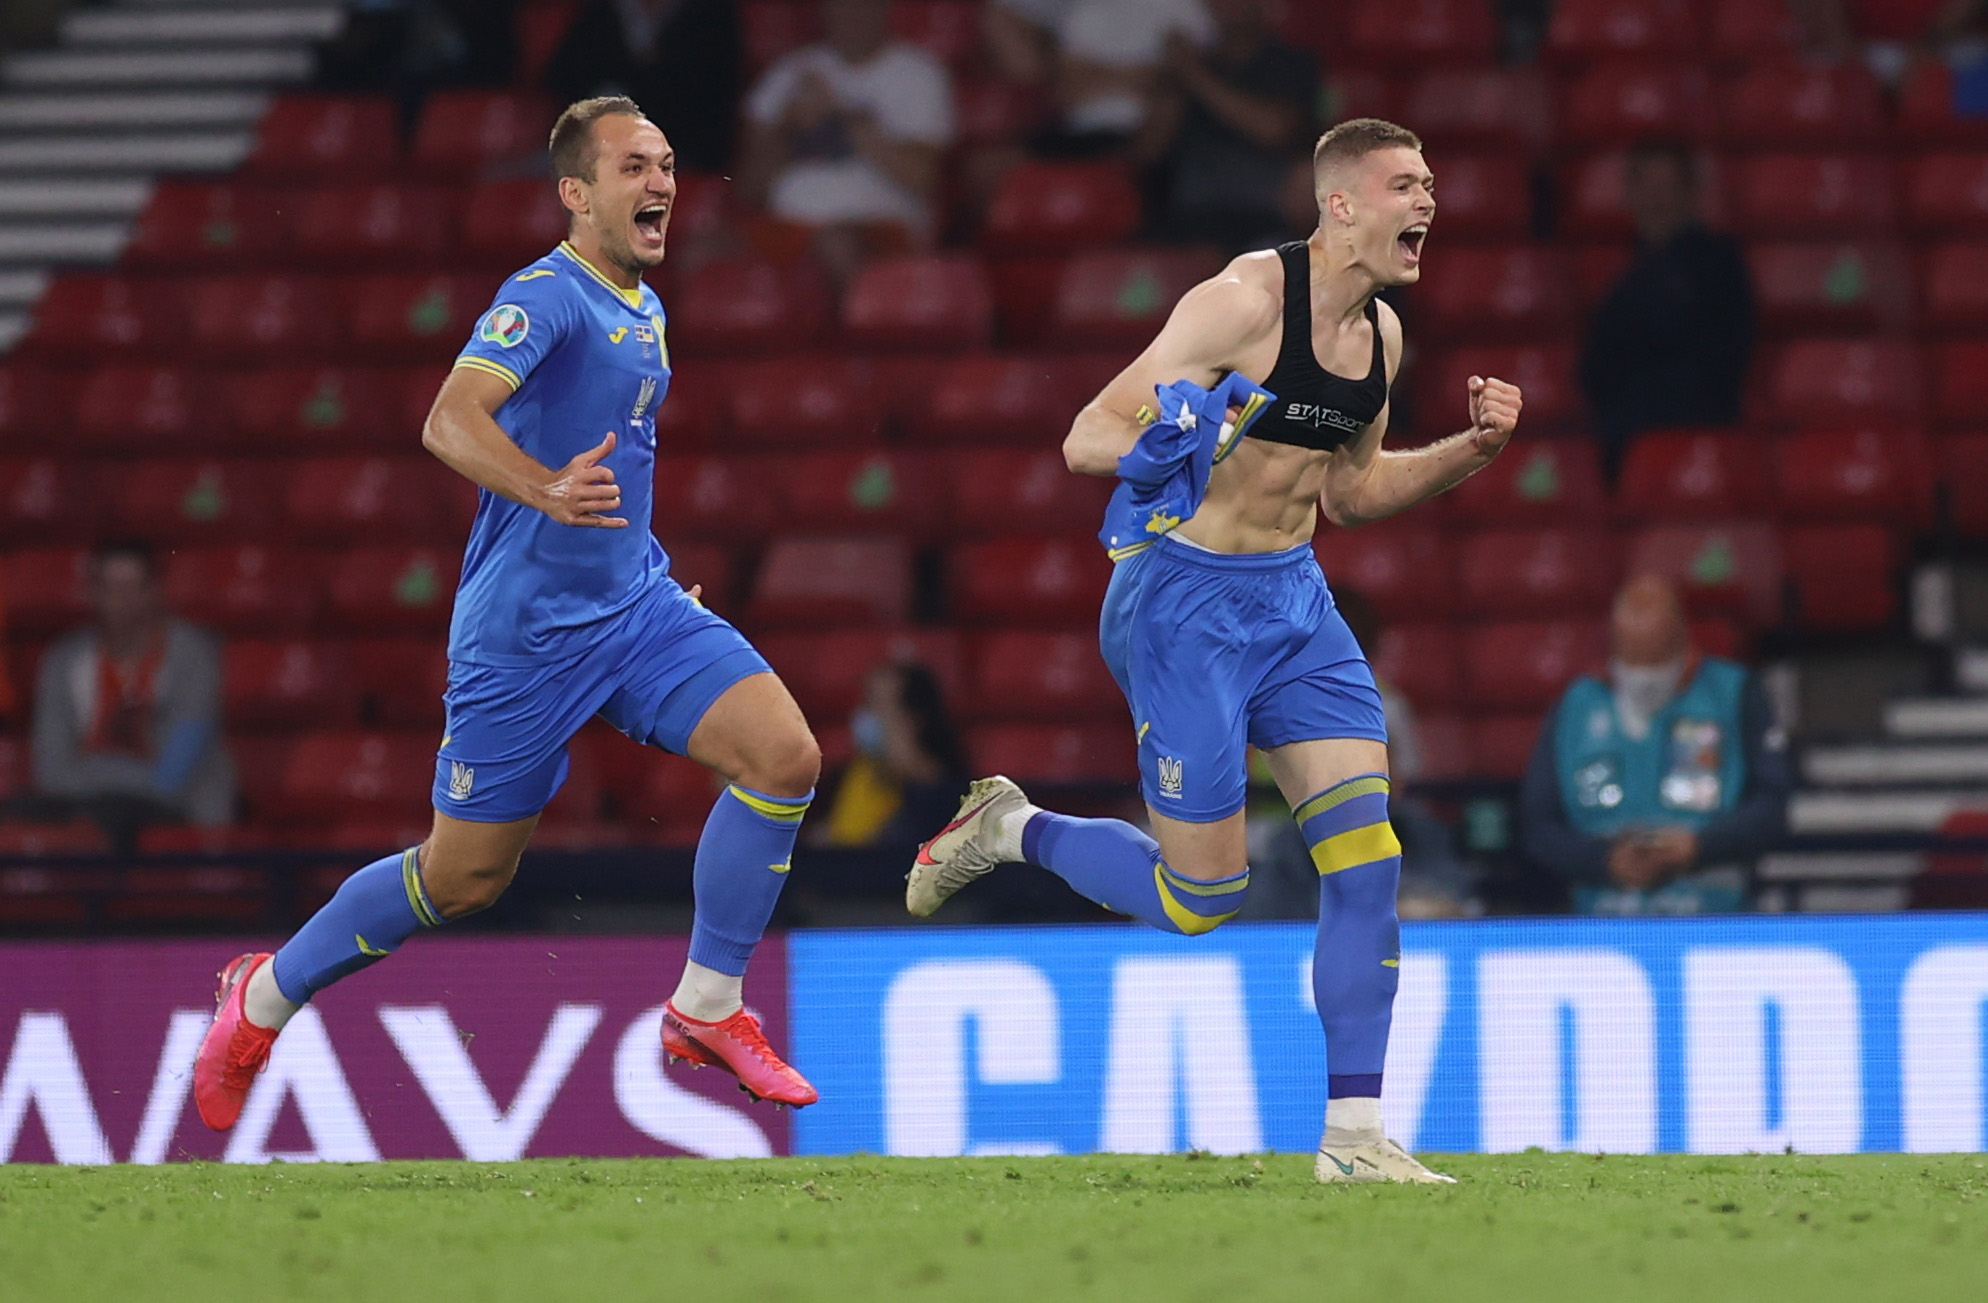 Euro 2020, Σουηδία – Ουκρανία 1-2: Με ήρωα τον Ντόβμπικ, στους «8» η ομάδα του Σεφτσένκο